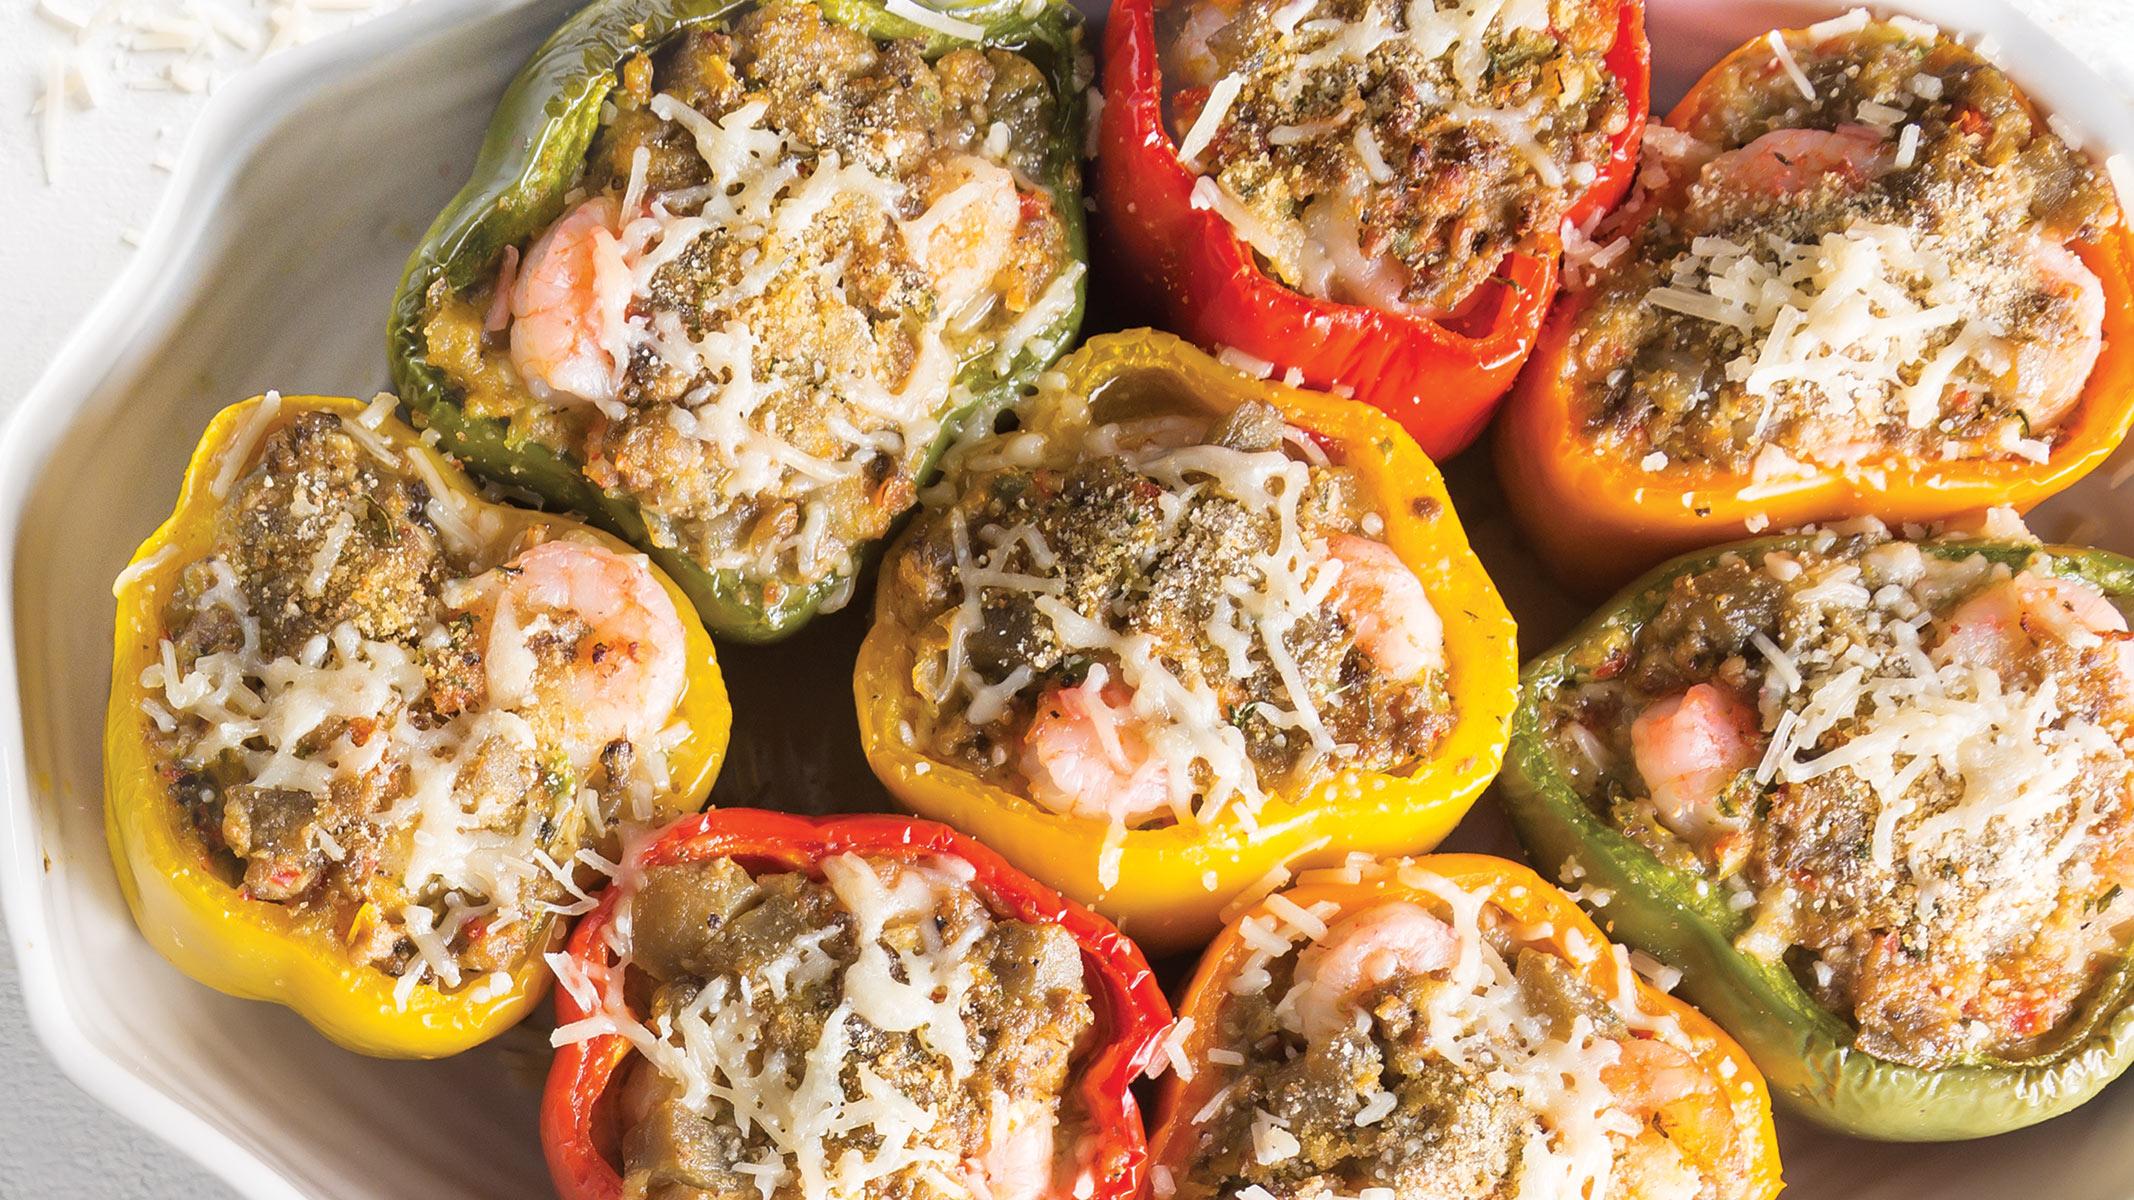 Chef John Folse S Eggplant Stuffed Bell Peppers With River Shrimp